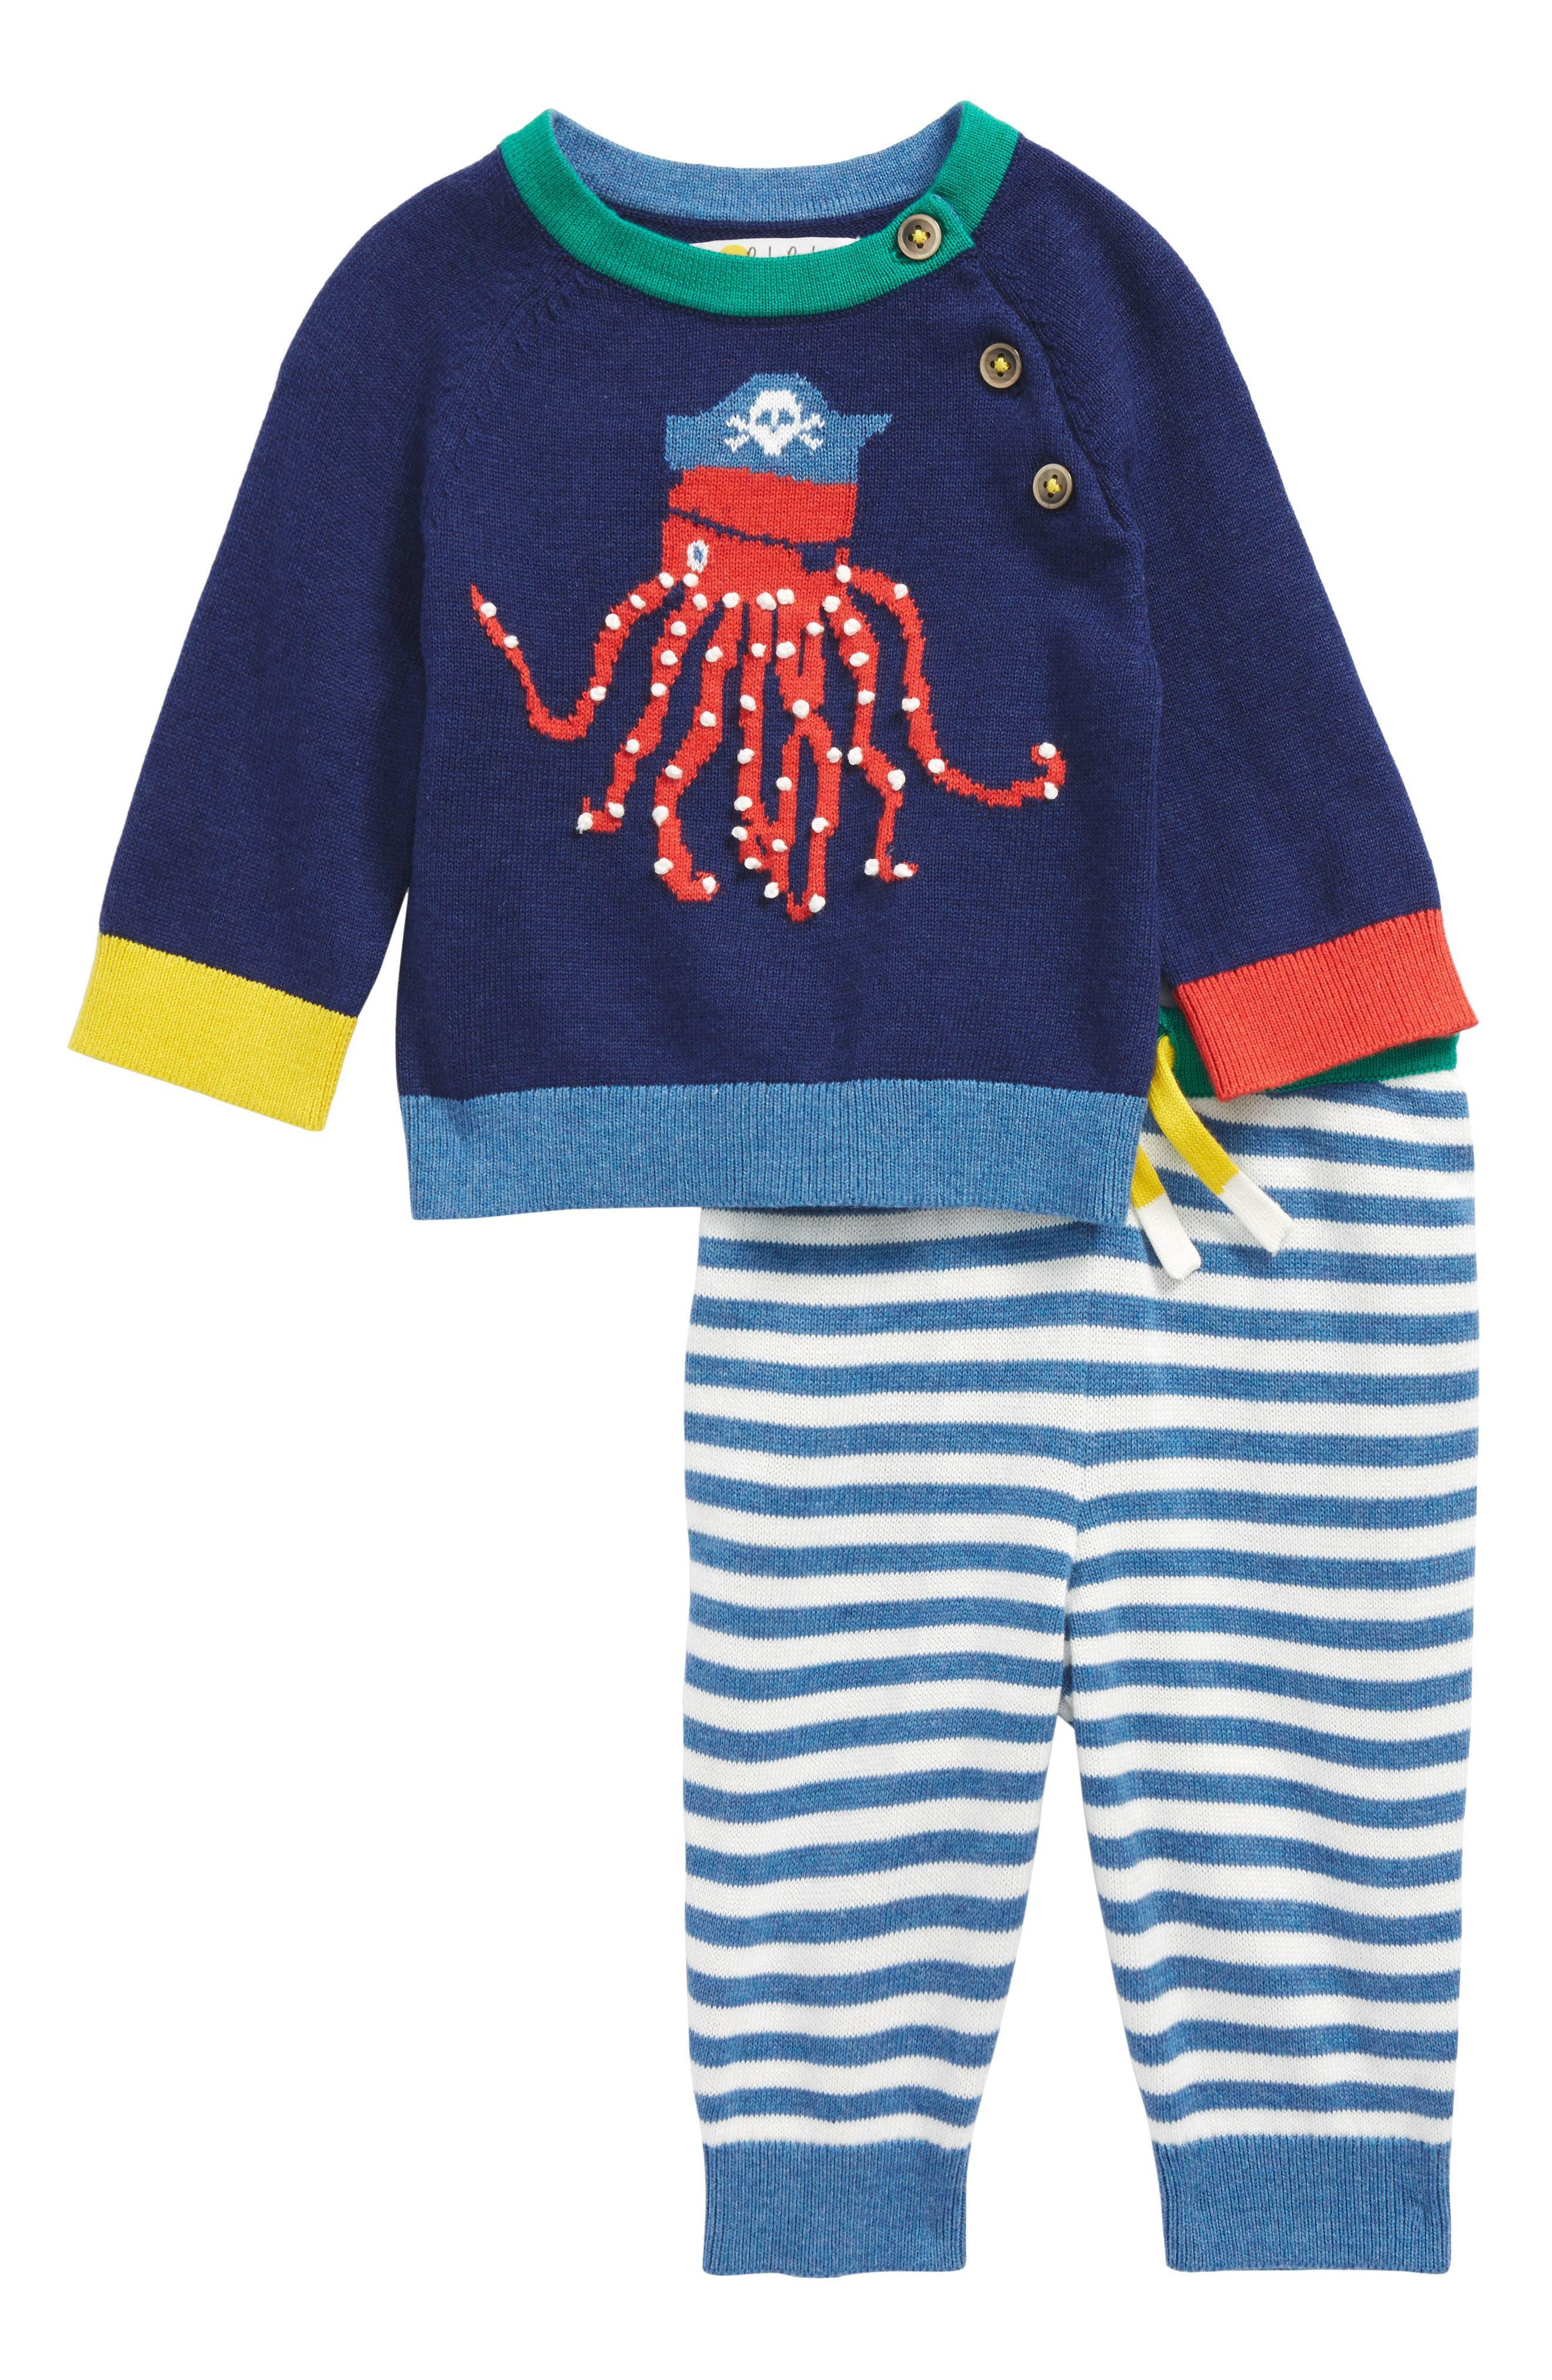 Octopus Sweater & Pants Set,                         Main,                         color, Beacon Blue Octopus